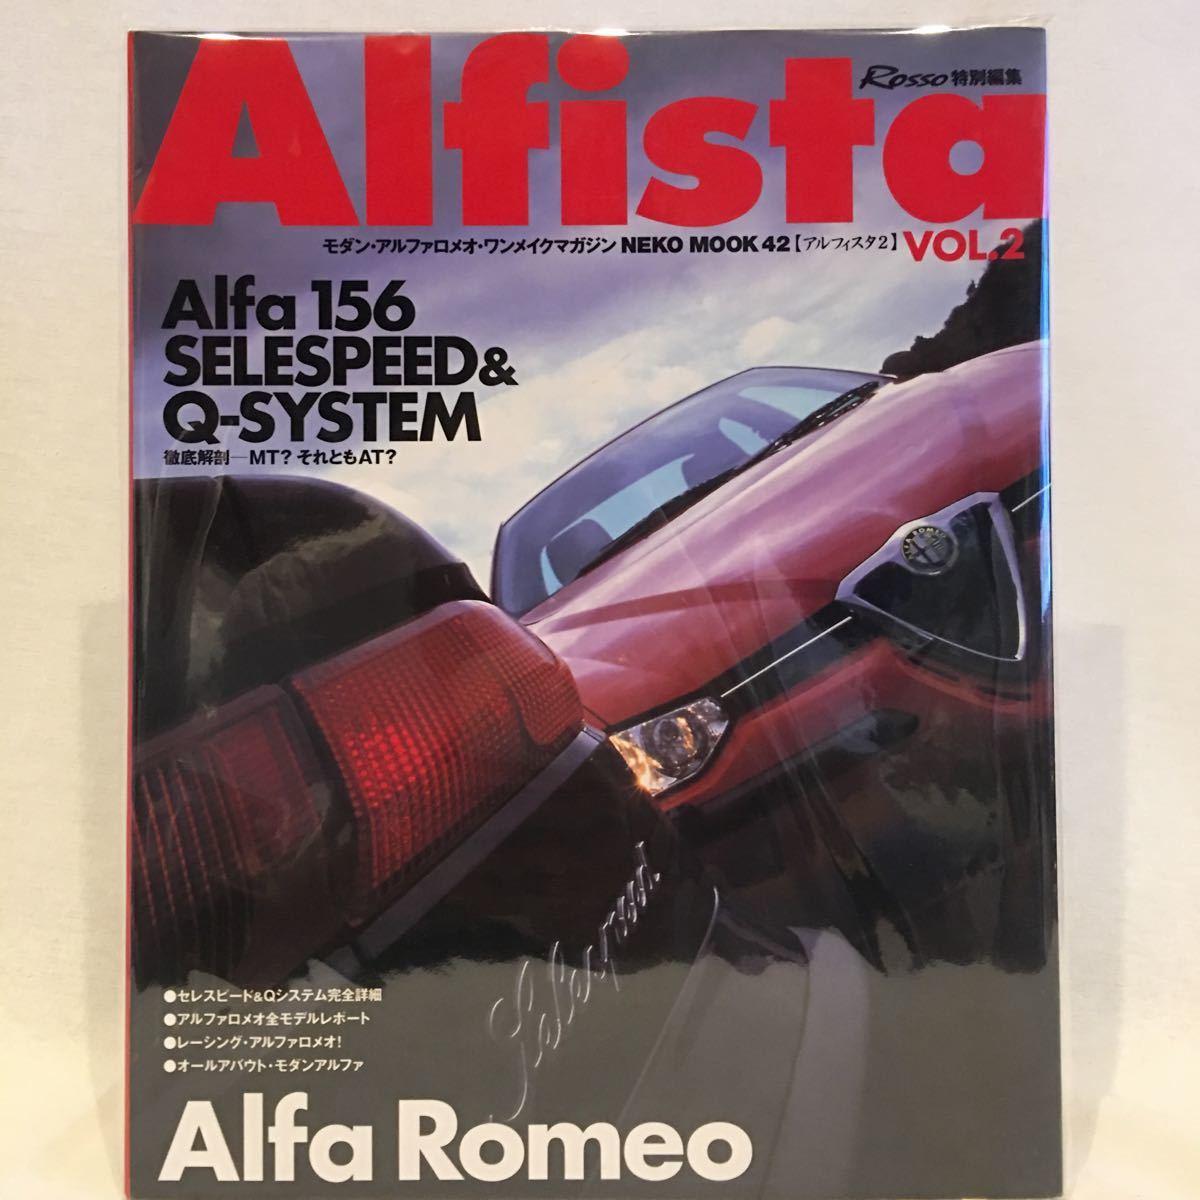 Alfista vol.2 アルファロメオ マガジン アルフィスタ Alfa 156 セレスピード 本 156 155 GTV 145 スパイダー_画像1